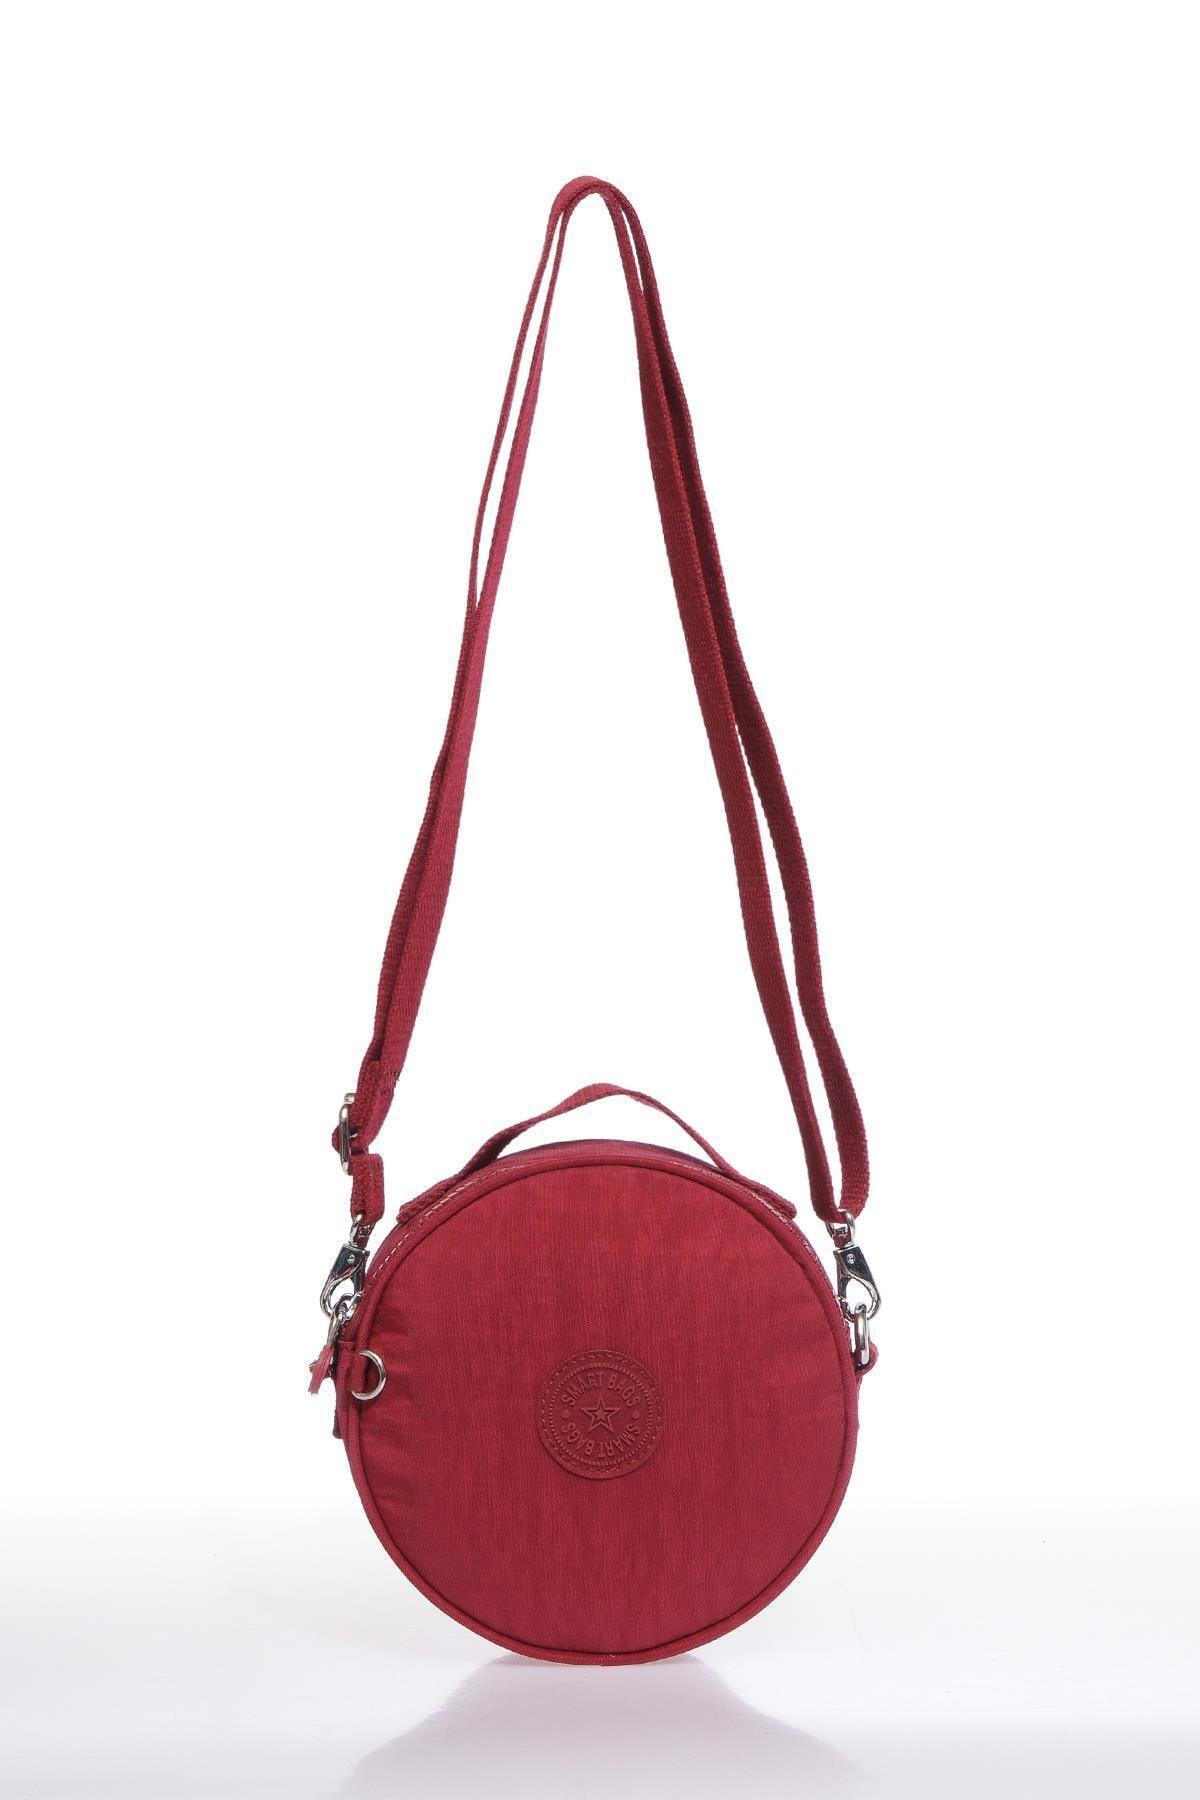 SMART BAGS Smb3024-0021 Bordo Kadın Çapraz Çanta 1